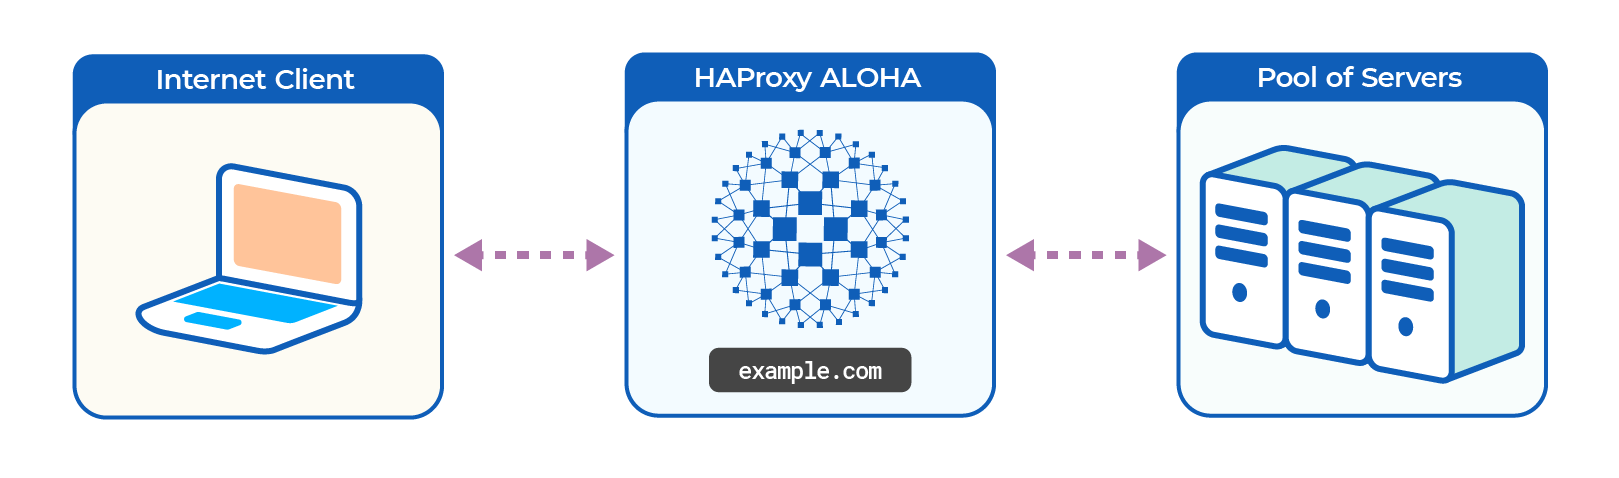 https://cdn.haproxy.com/documentation/aloha/10-5/assets/aloha-overview-c737b3e0e2fe4b264d6fa7af6d63614fb1d945db5bf5804bfabcadfc4c085da8.png